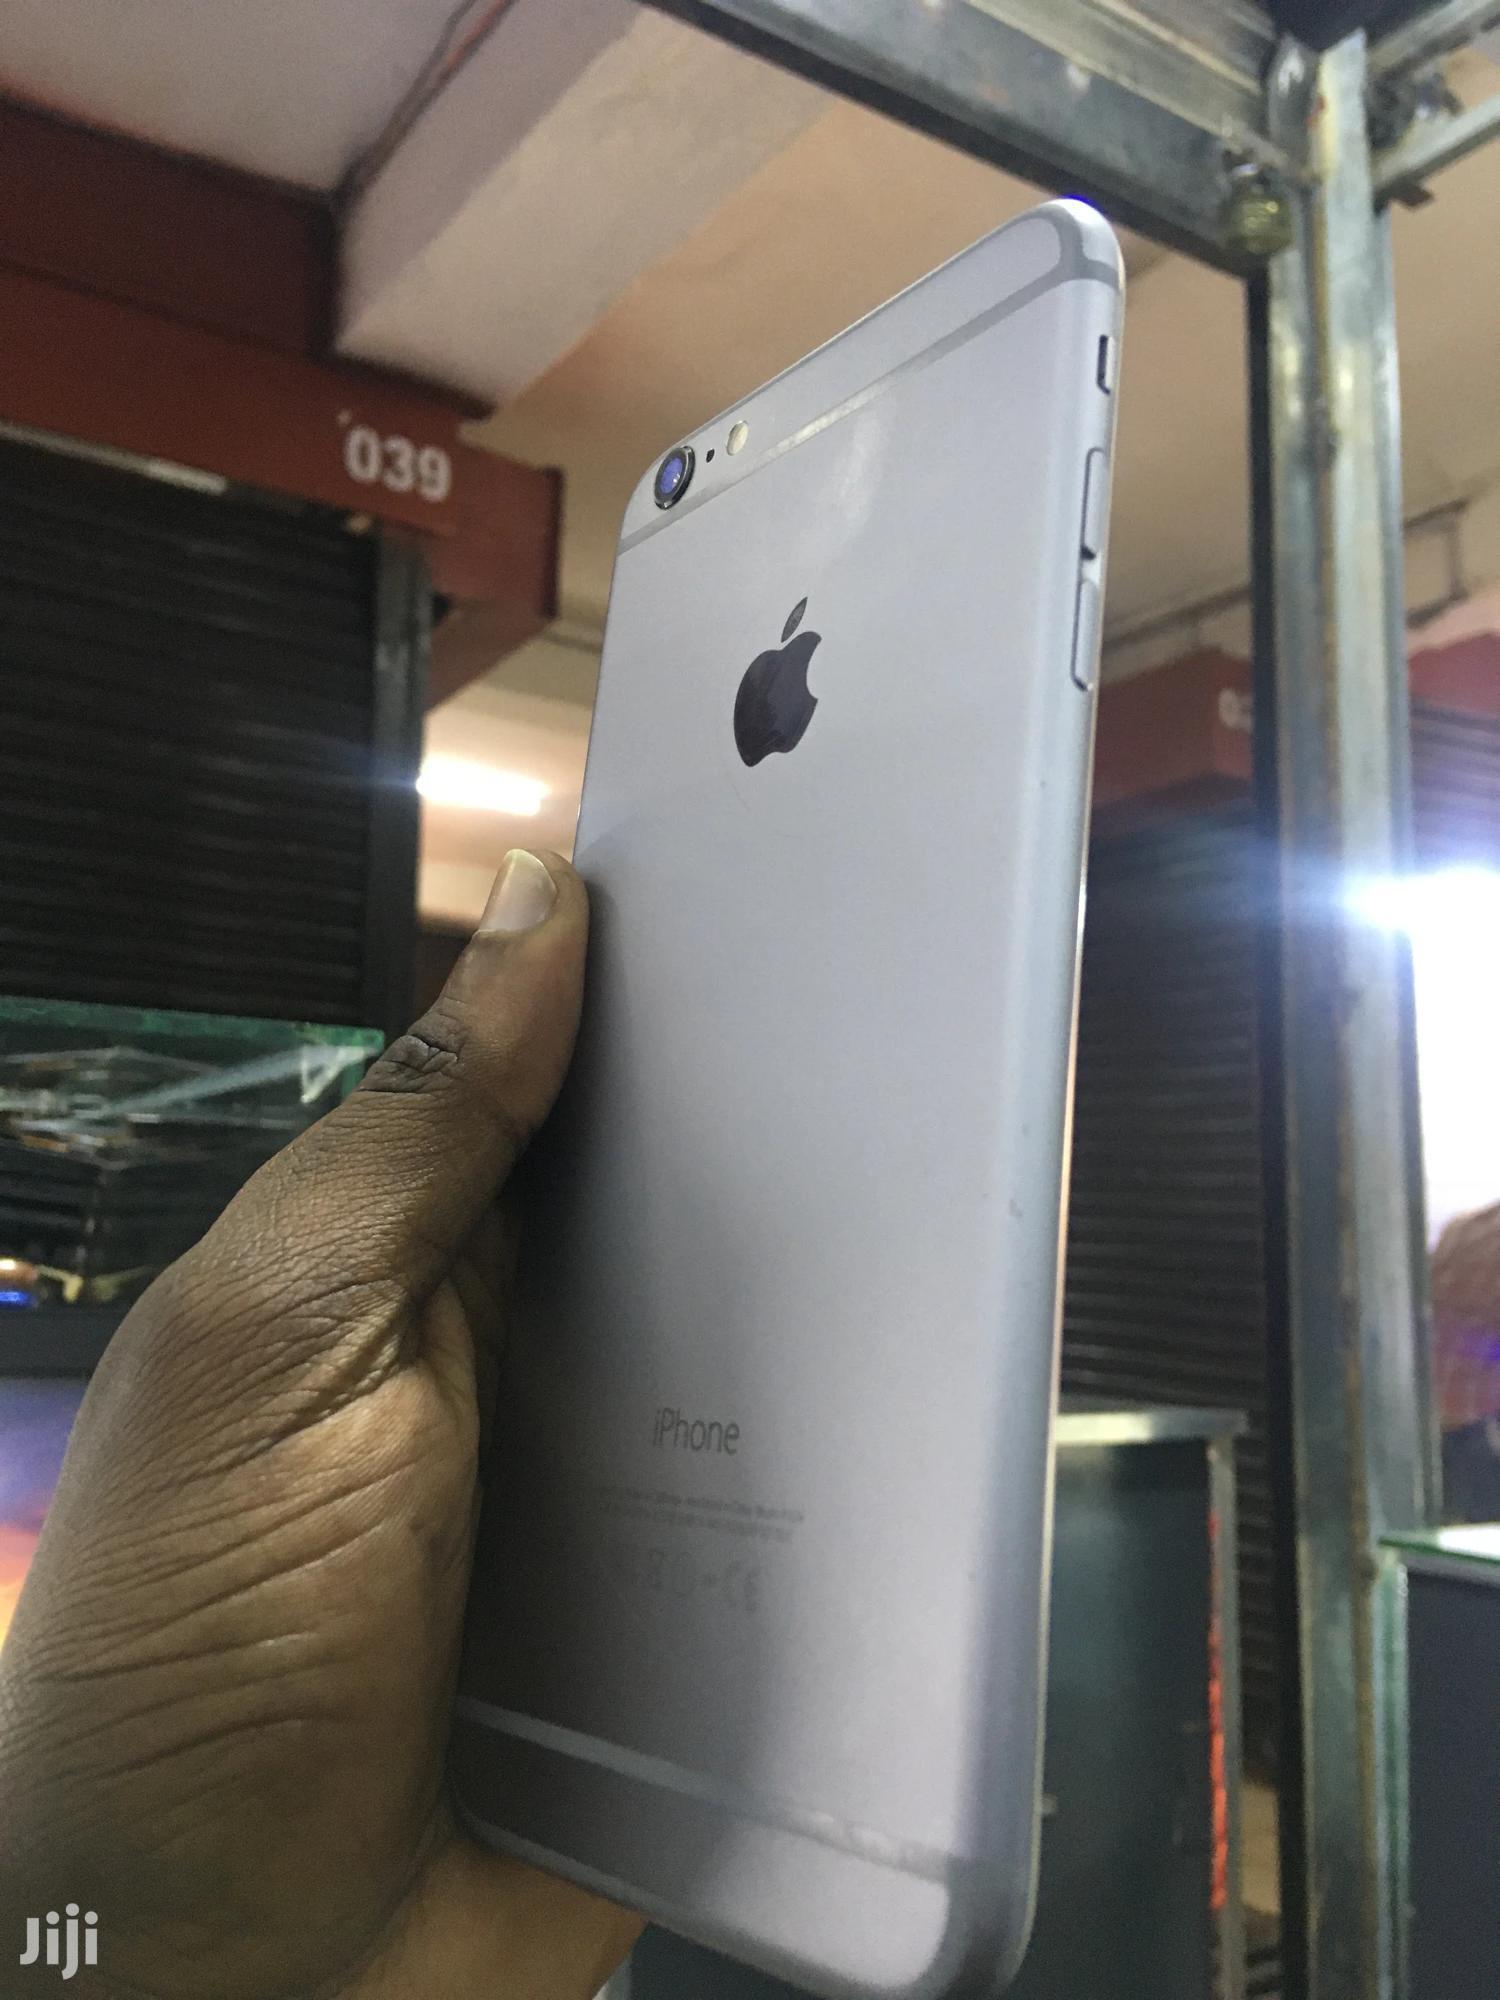 Apple iPhone 6 Plus 64 GB Silver   Mobile Phones for sale in Kampala, Central Region, Uganda